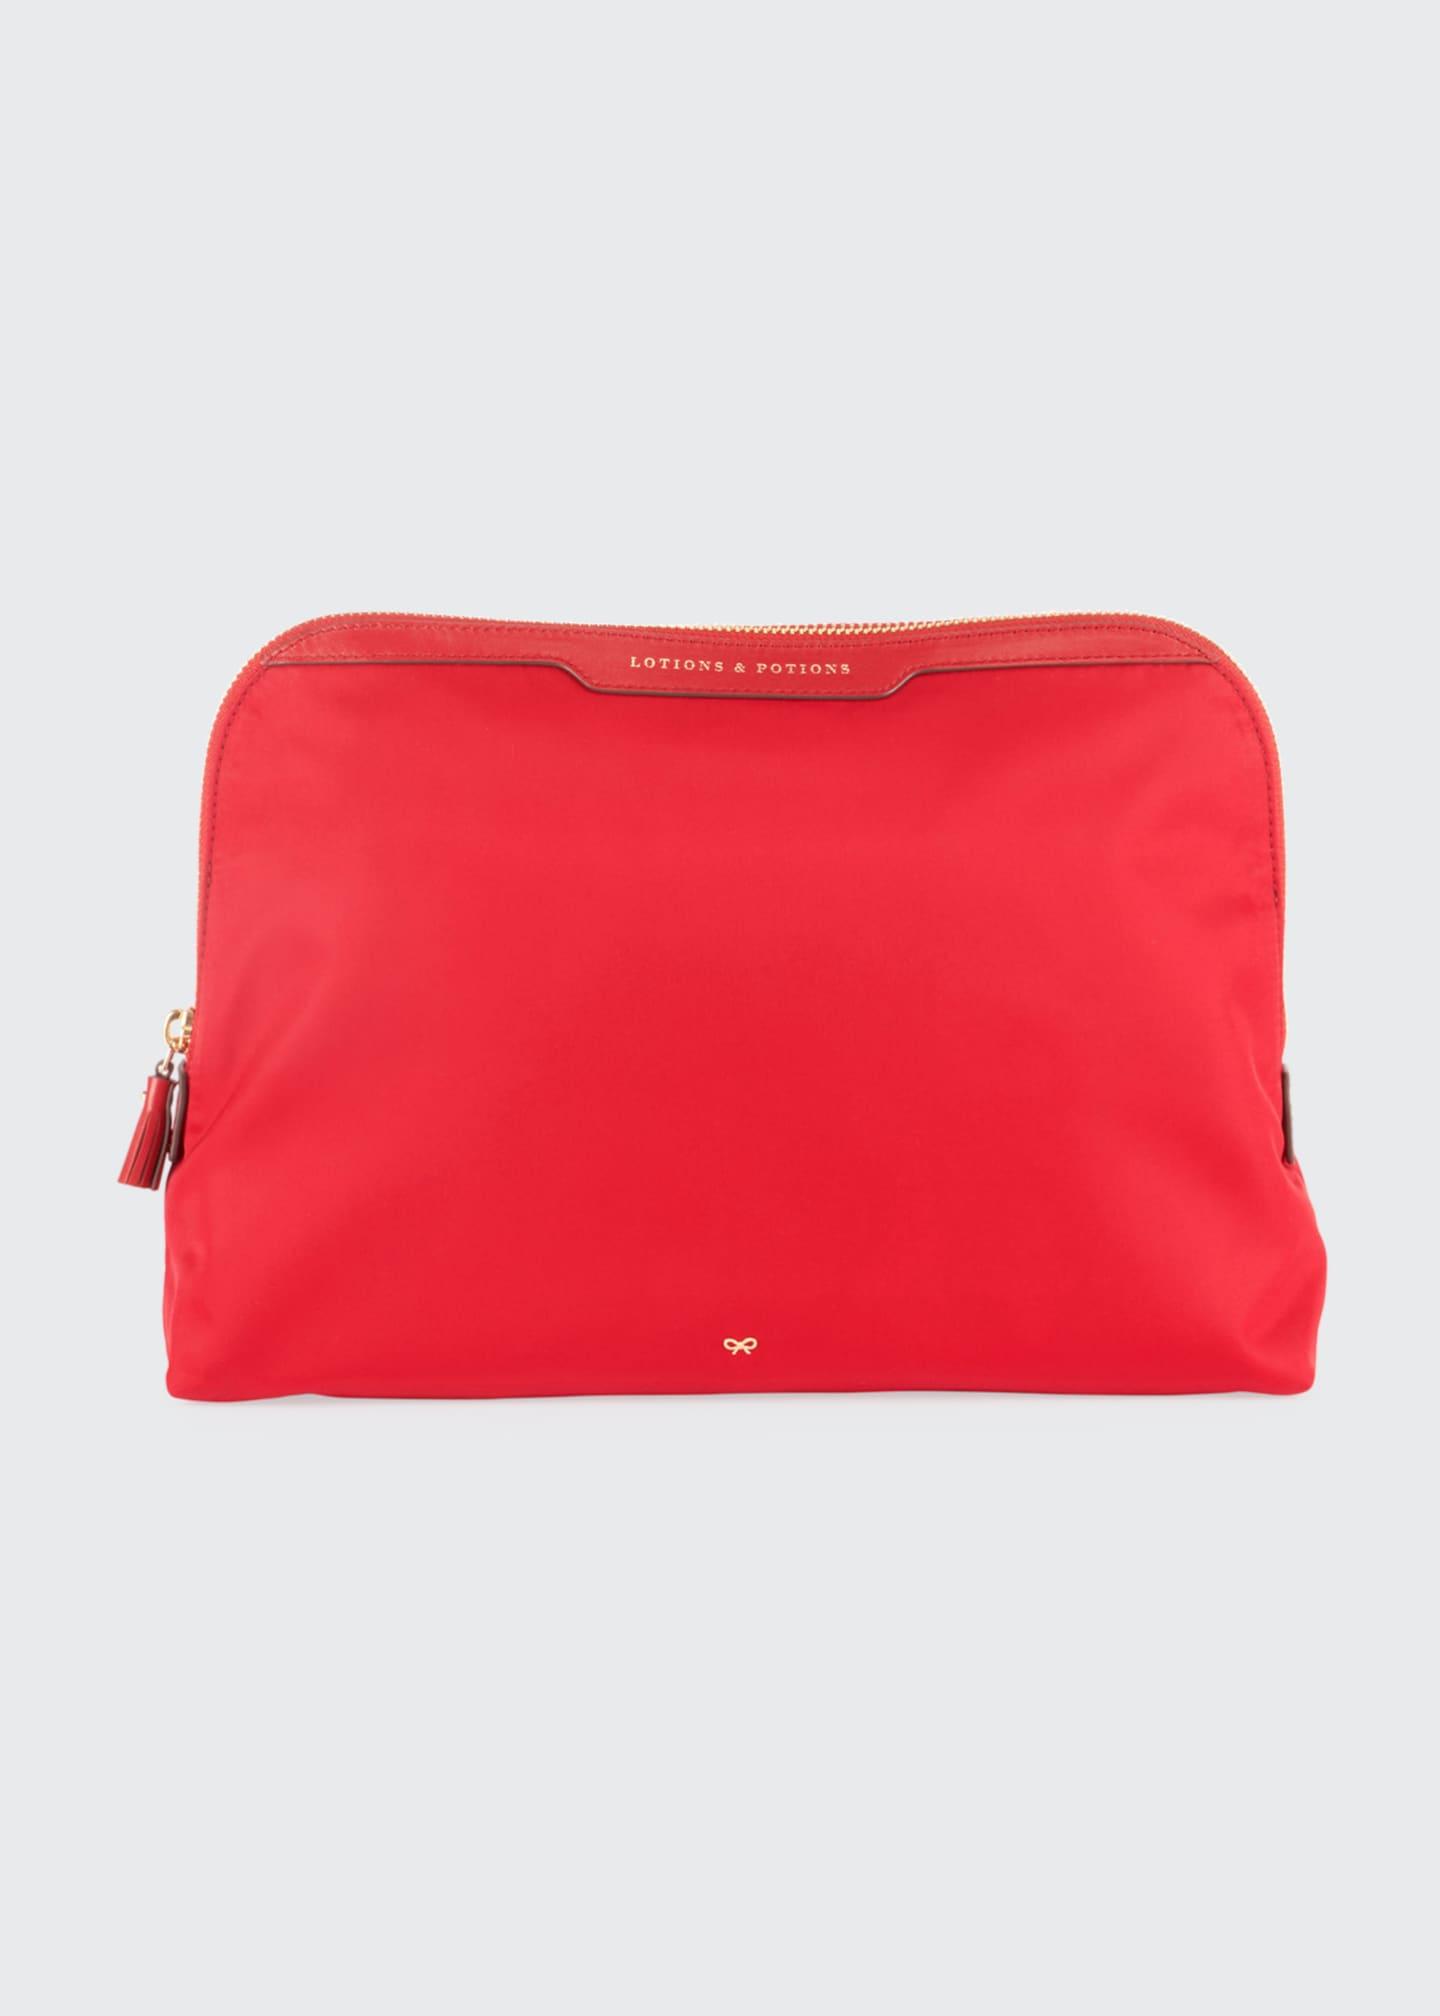 Anya Hindmarch Lotions & Potions Cosmetics Bag, Red